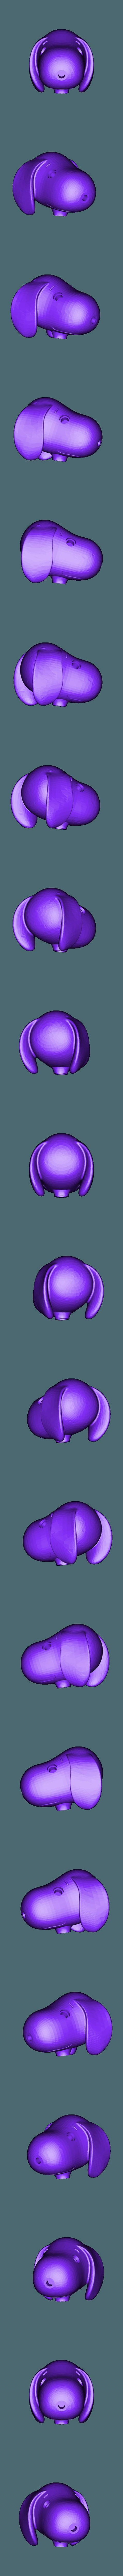 Snoopy_Cabeza_Vertical.stl Download free STL file Snoopy • 3D printable design, Rodrim